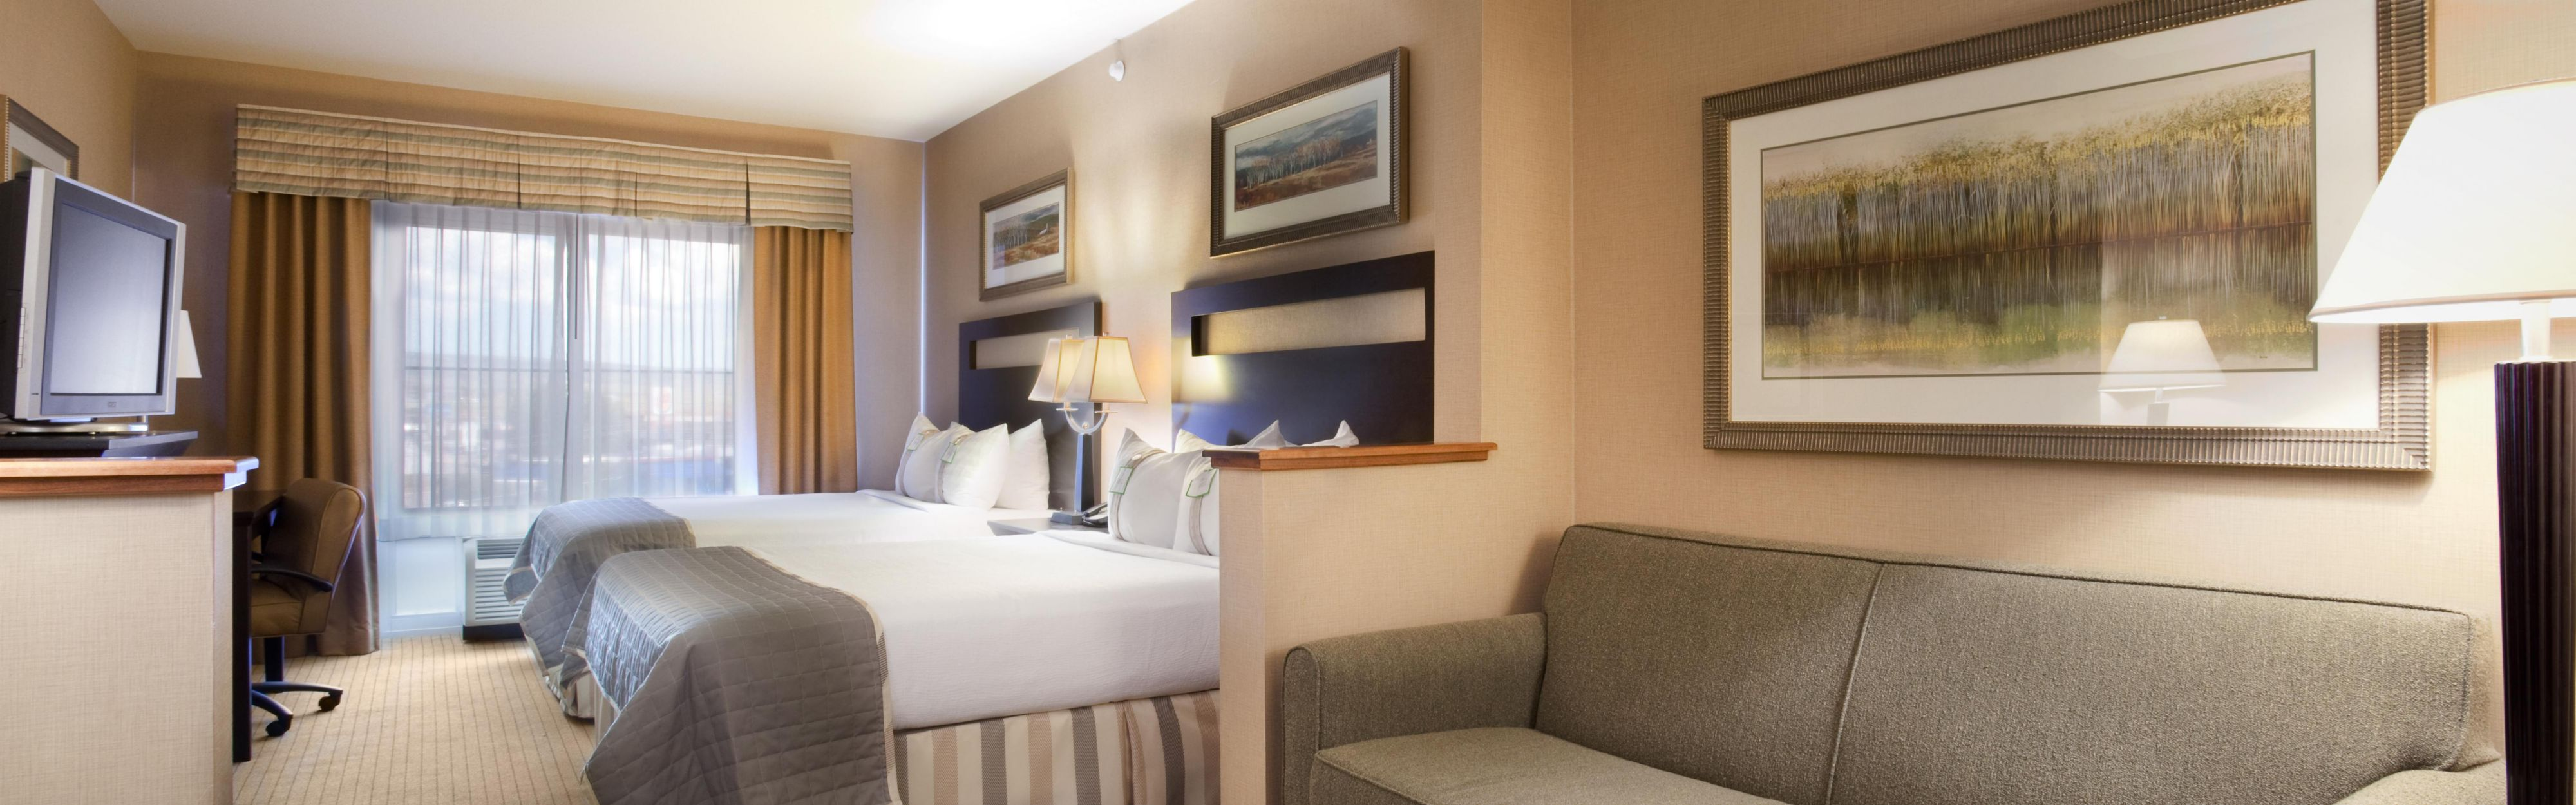 Holiday Inn Laramie image 1